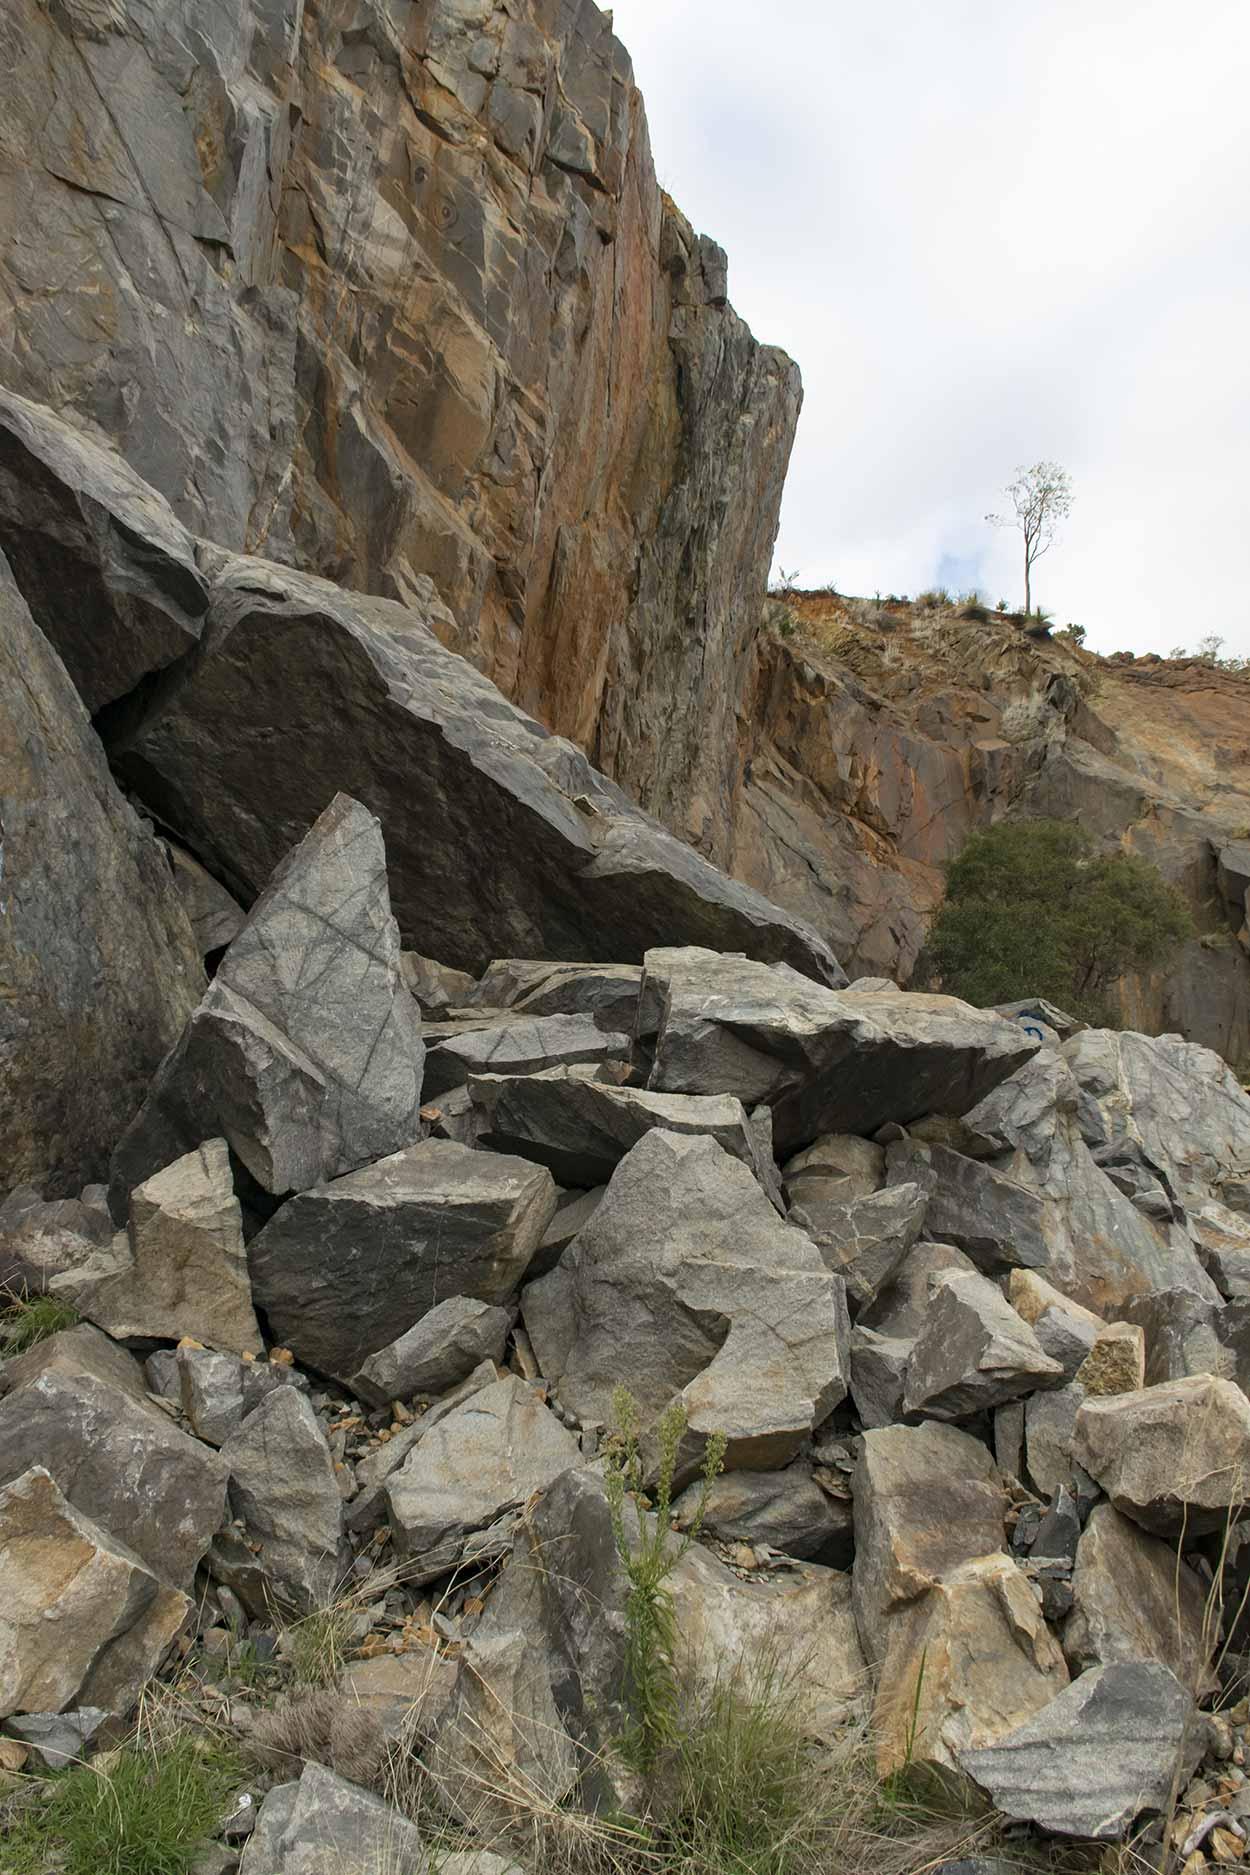 Statham's Quarry, Gooseberry Hill, Perth, Western Australia